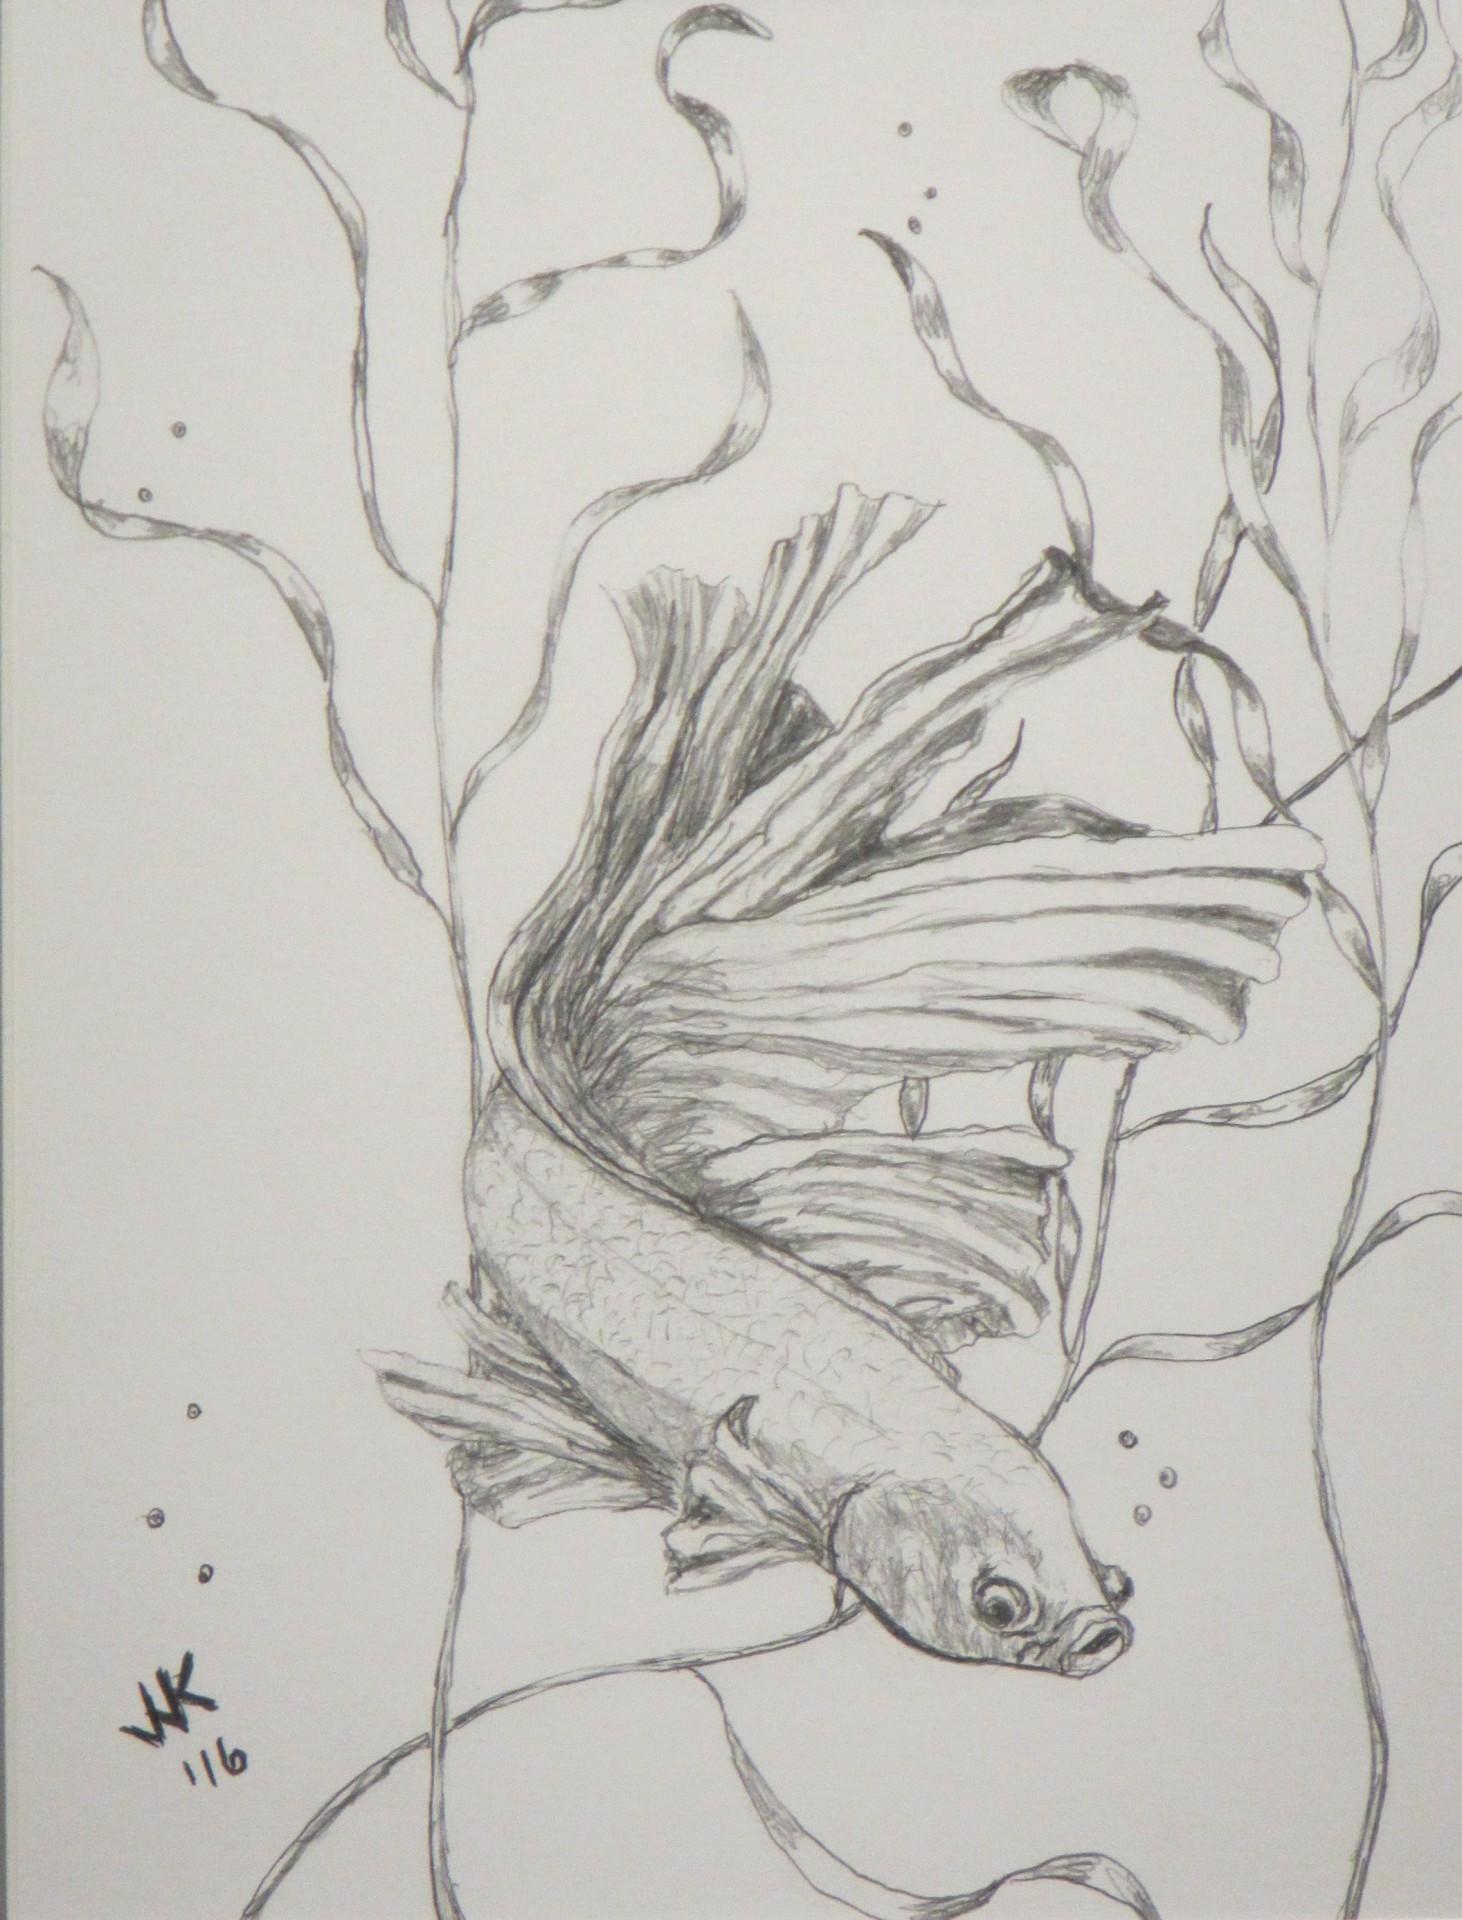 A siamese fighting fish.